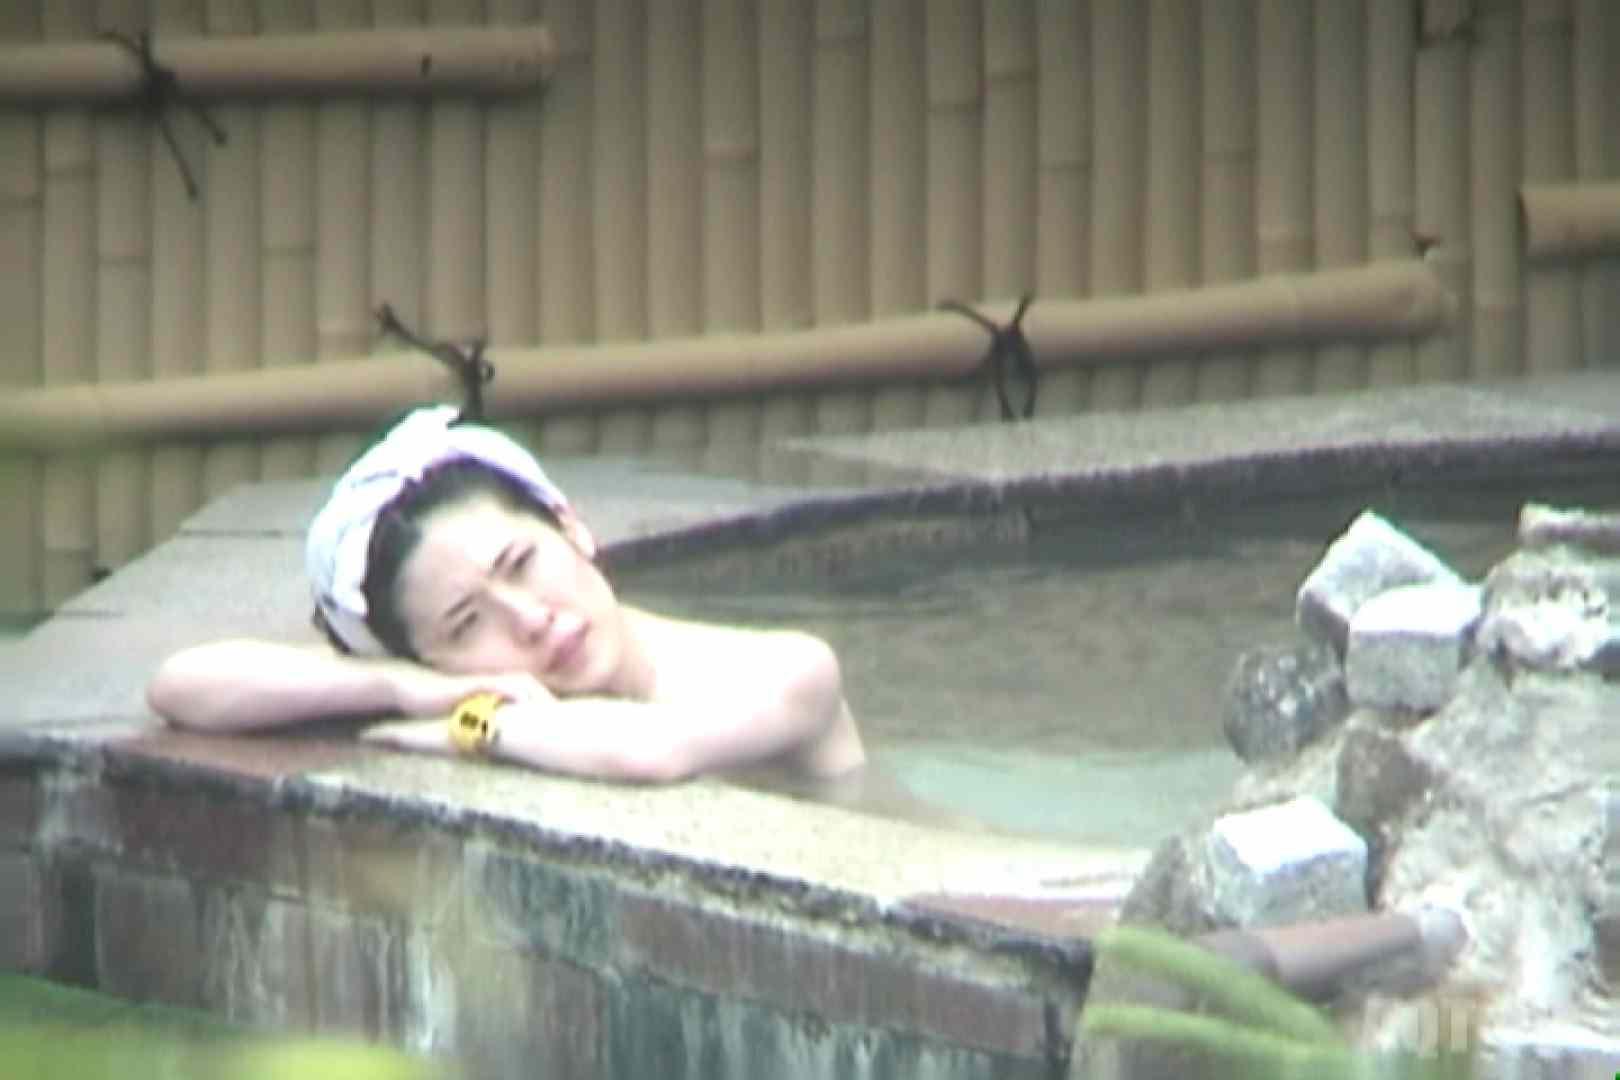 Aquaな露天風呂Vol.793 露天 | OLセックス  94画像 28